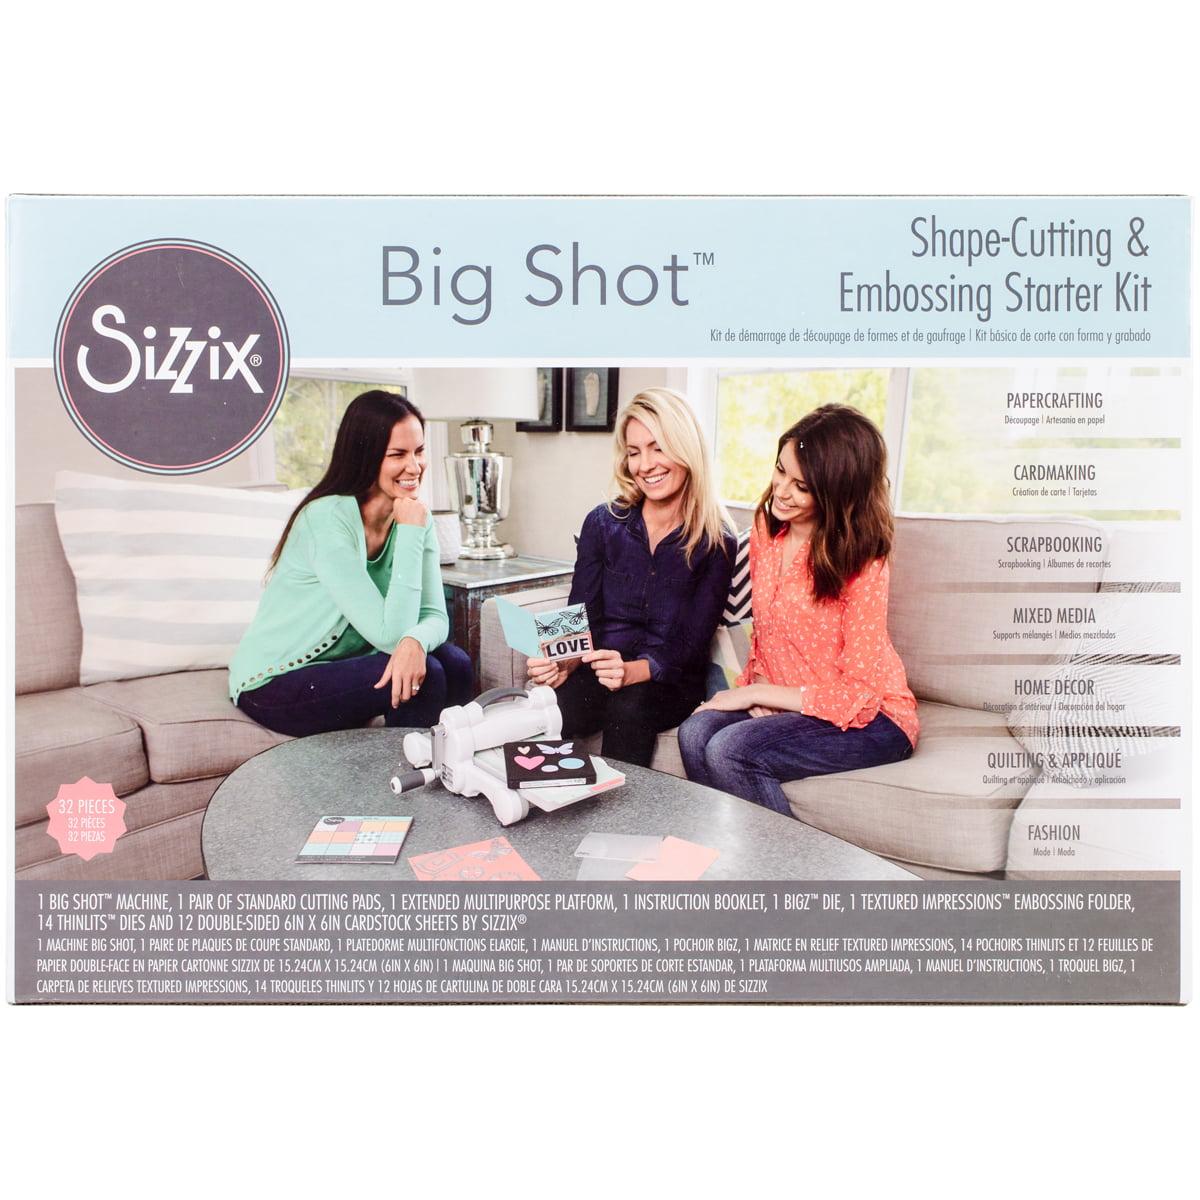 Sizzix Big Shot Starter Kit-White W/Gray